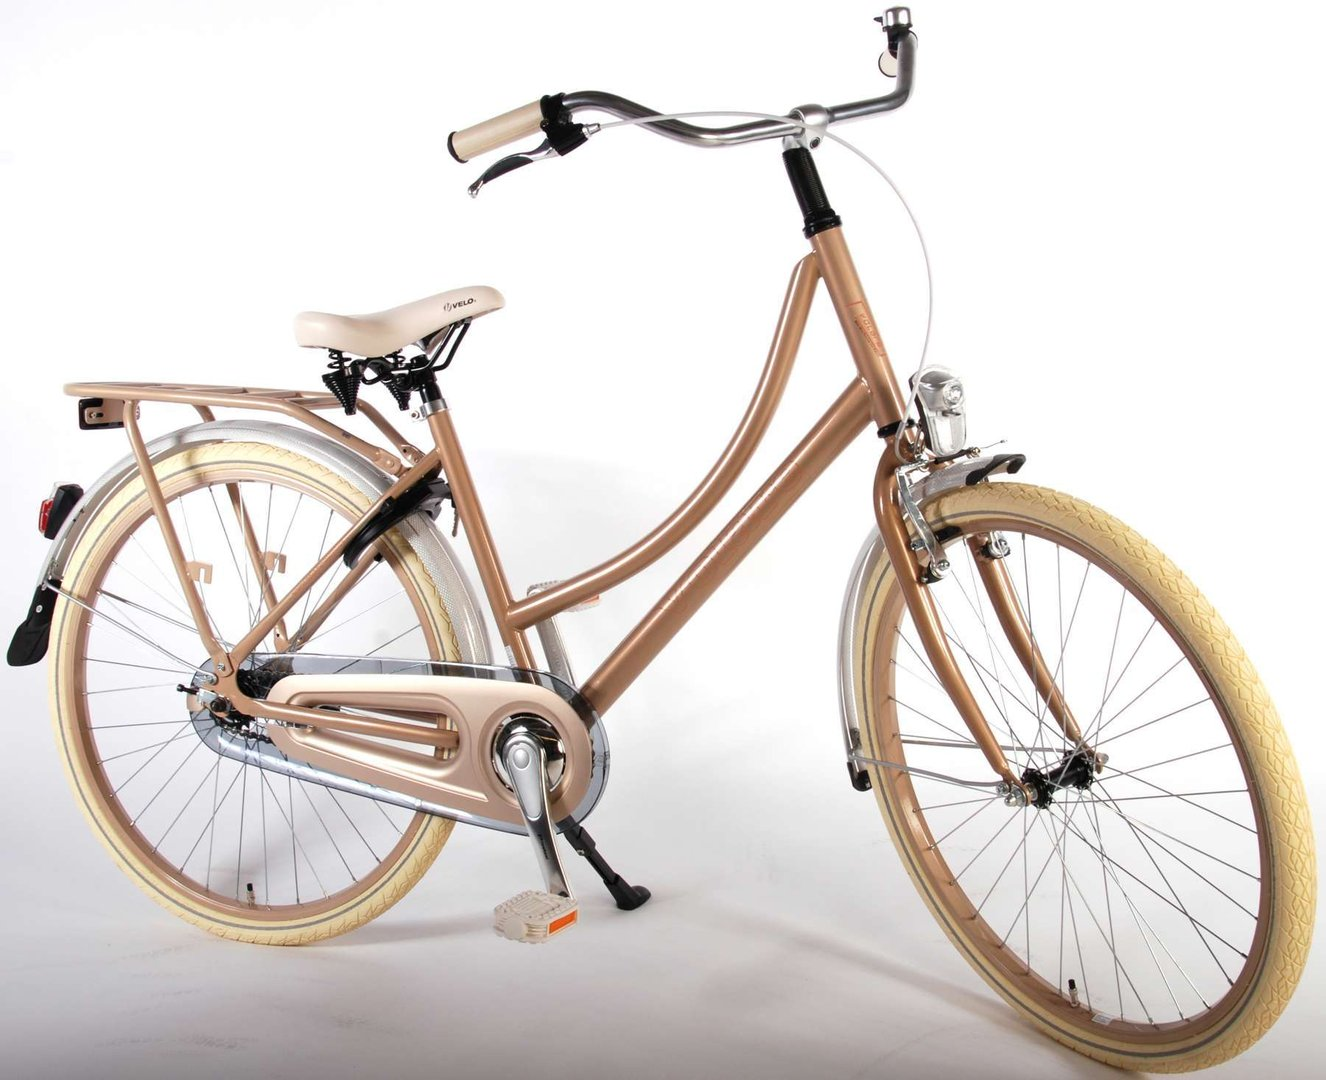 volare 26 zoll hollandrad lolz champagner fahrrad ass. Black Bedroom Furniture Sets. Home Design Ideas